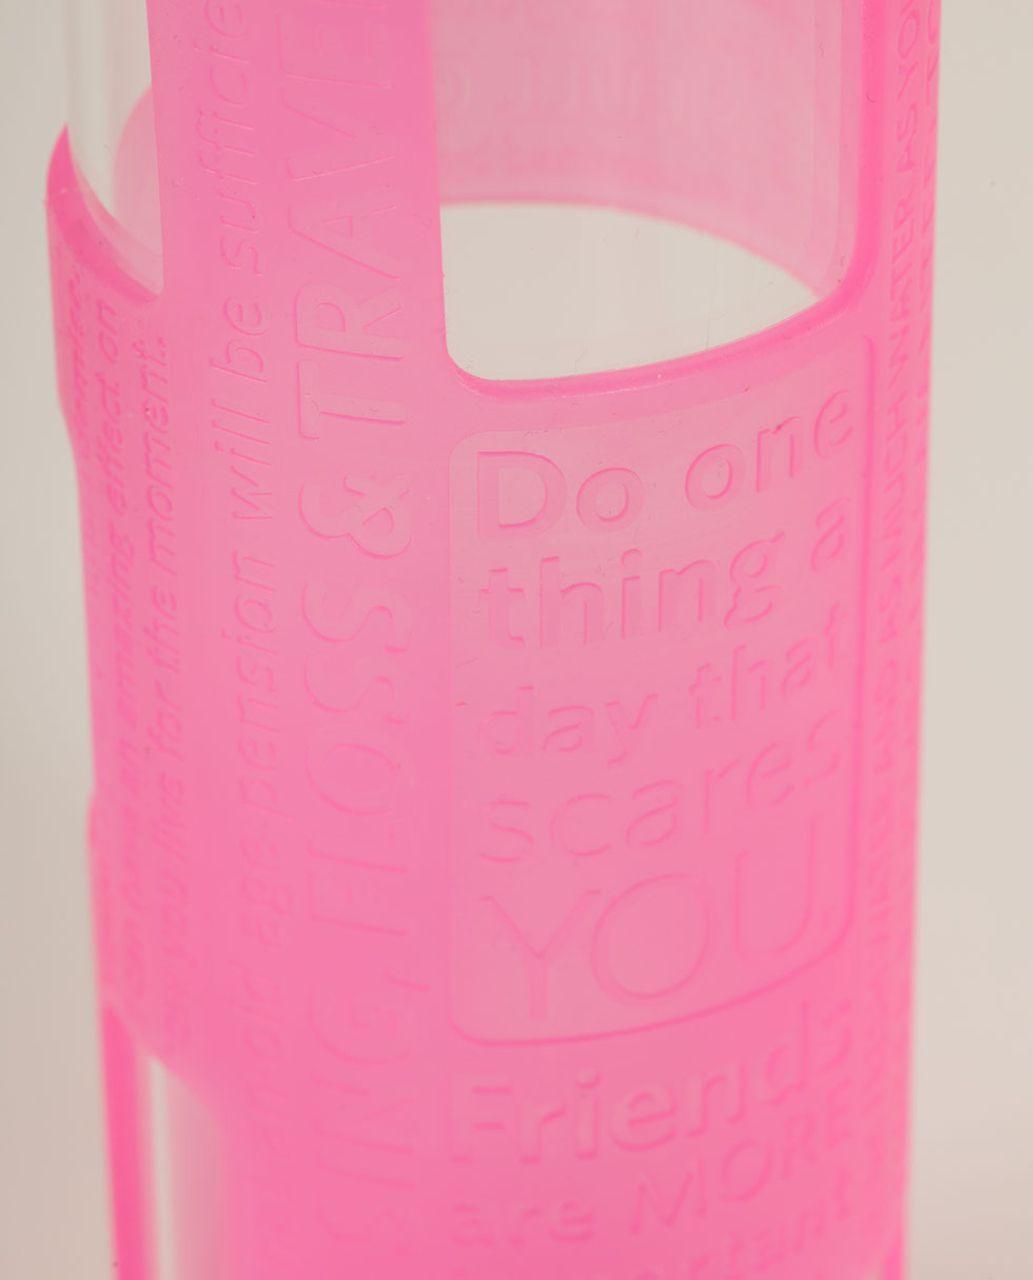 Lululemon Pure Balance Water Bottle - Raspberry Glo Light